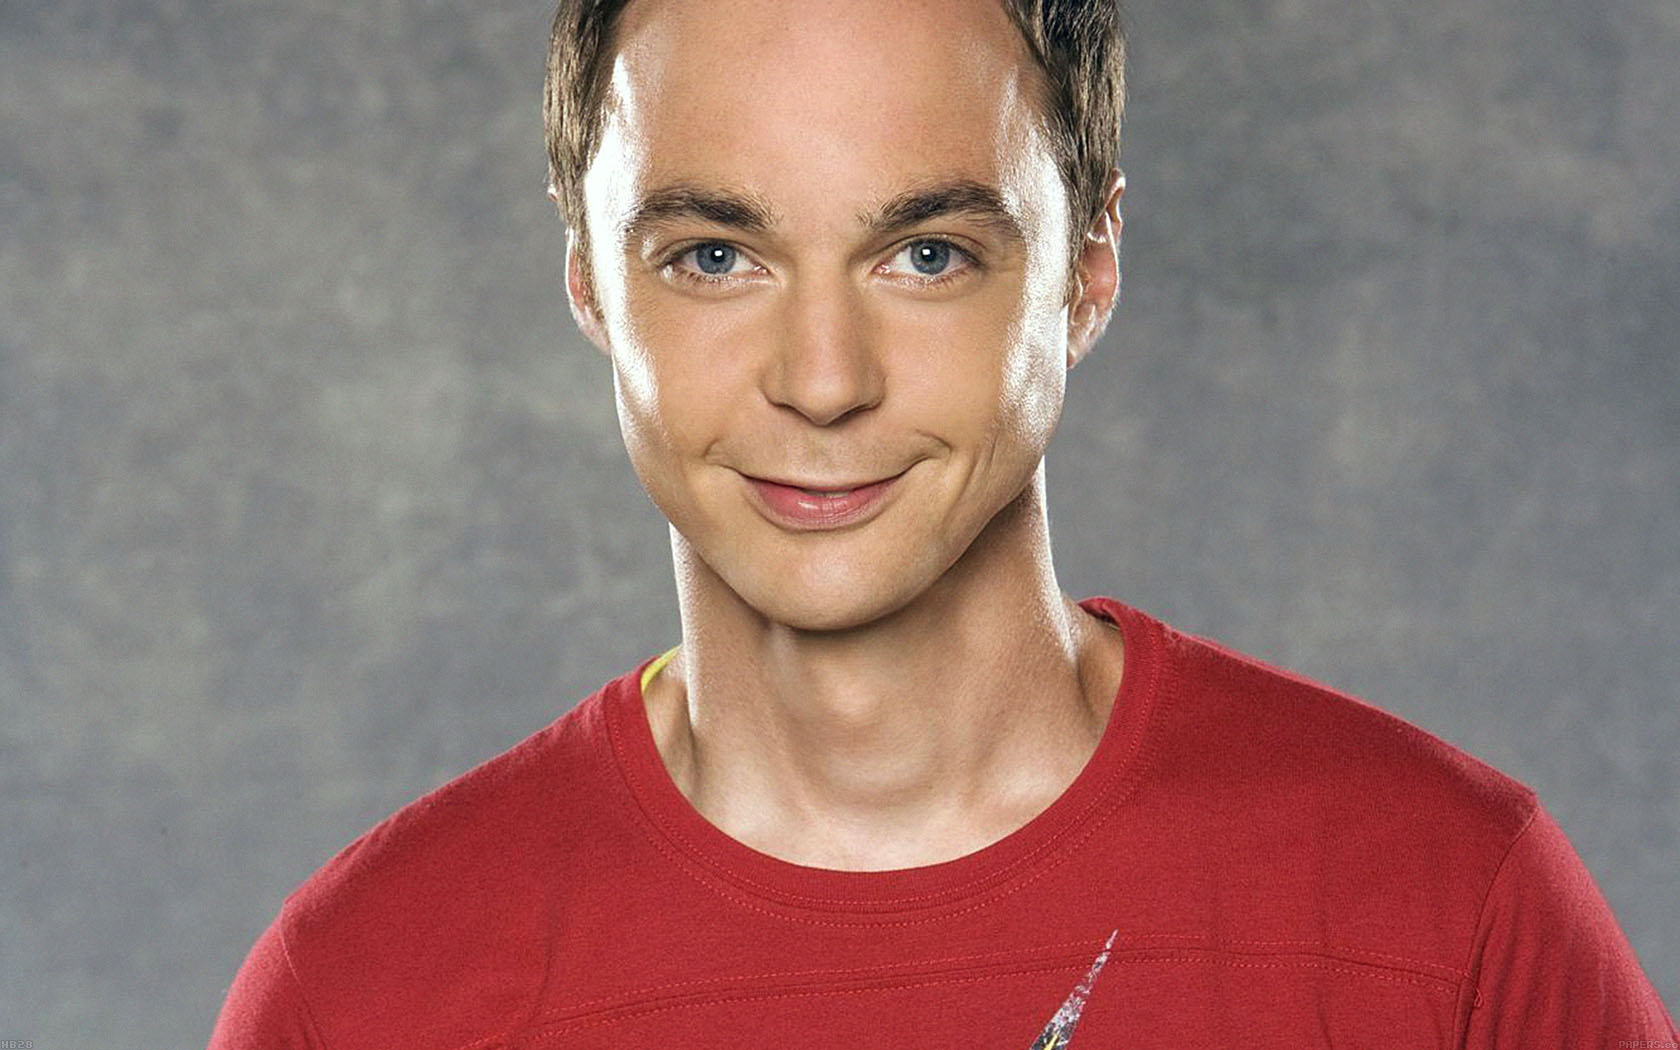 The Flash Iphone Wallpaper Hb28 Wallpaper Sheldon Cooper Big Bang Theory Bazinga